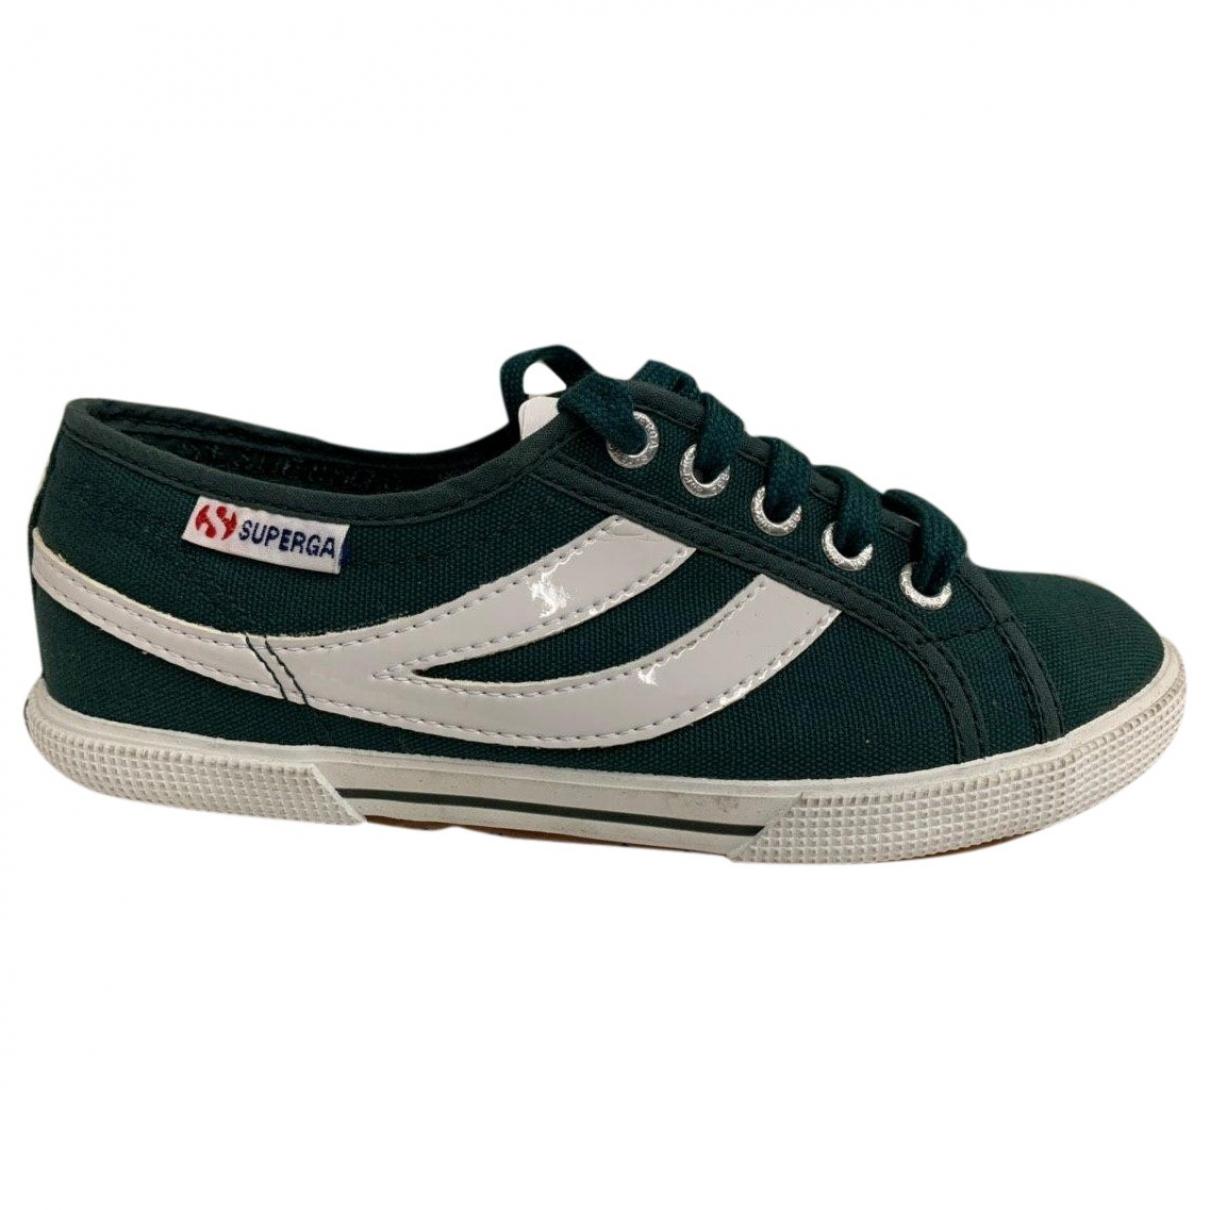 Superga \N Sneakers in  Gruen Leinen